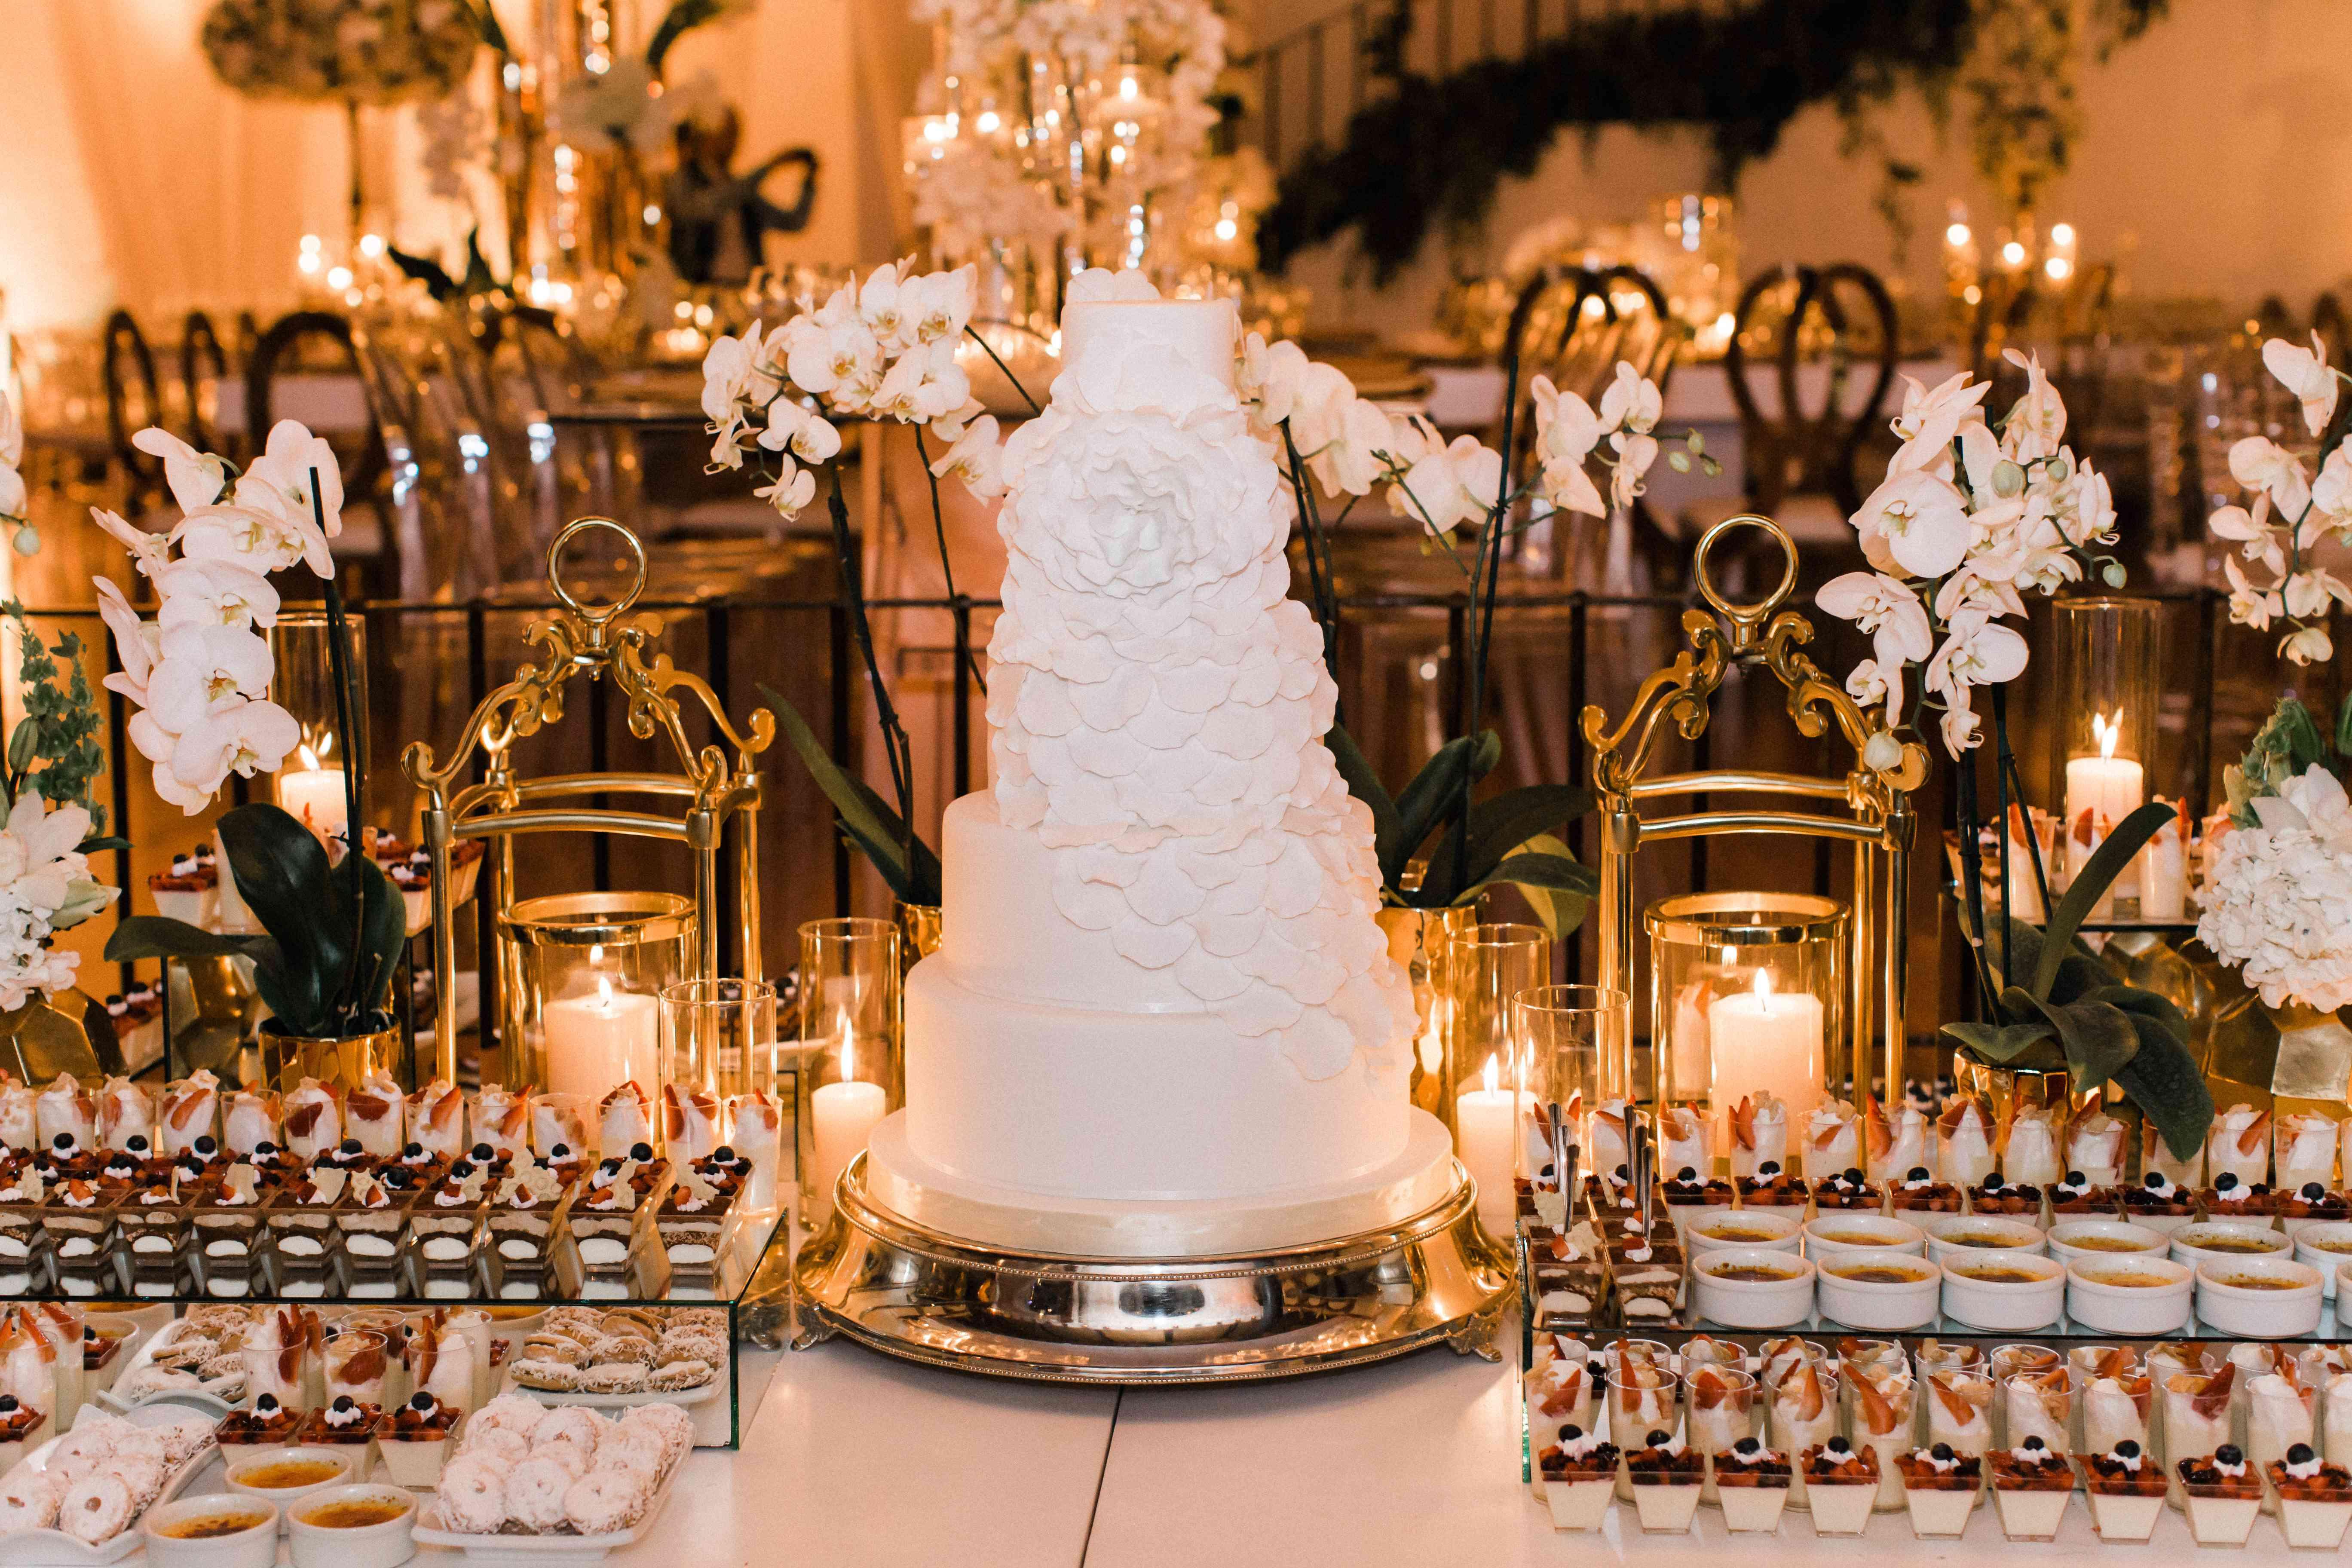 <p>wedding cake and dessert bar</p><br><br>